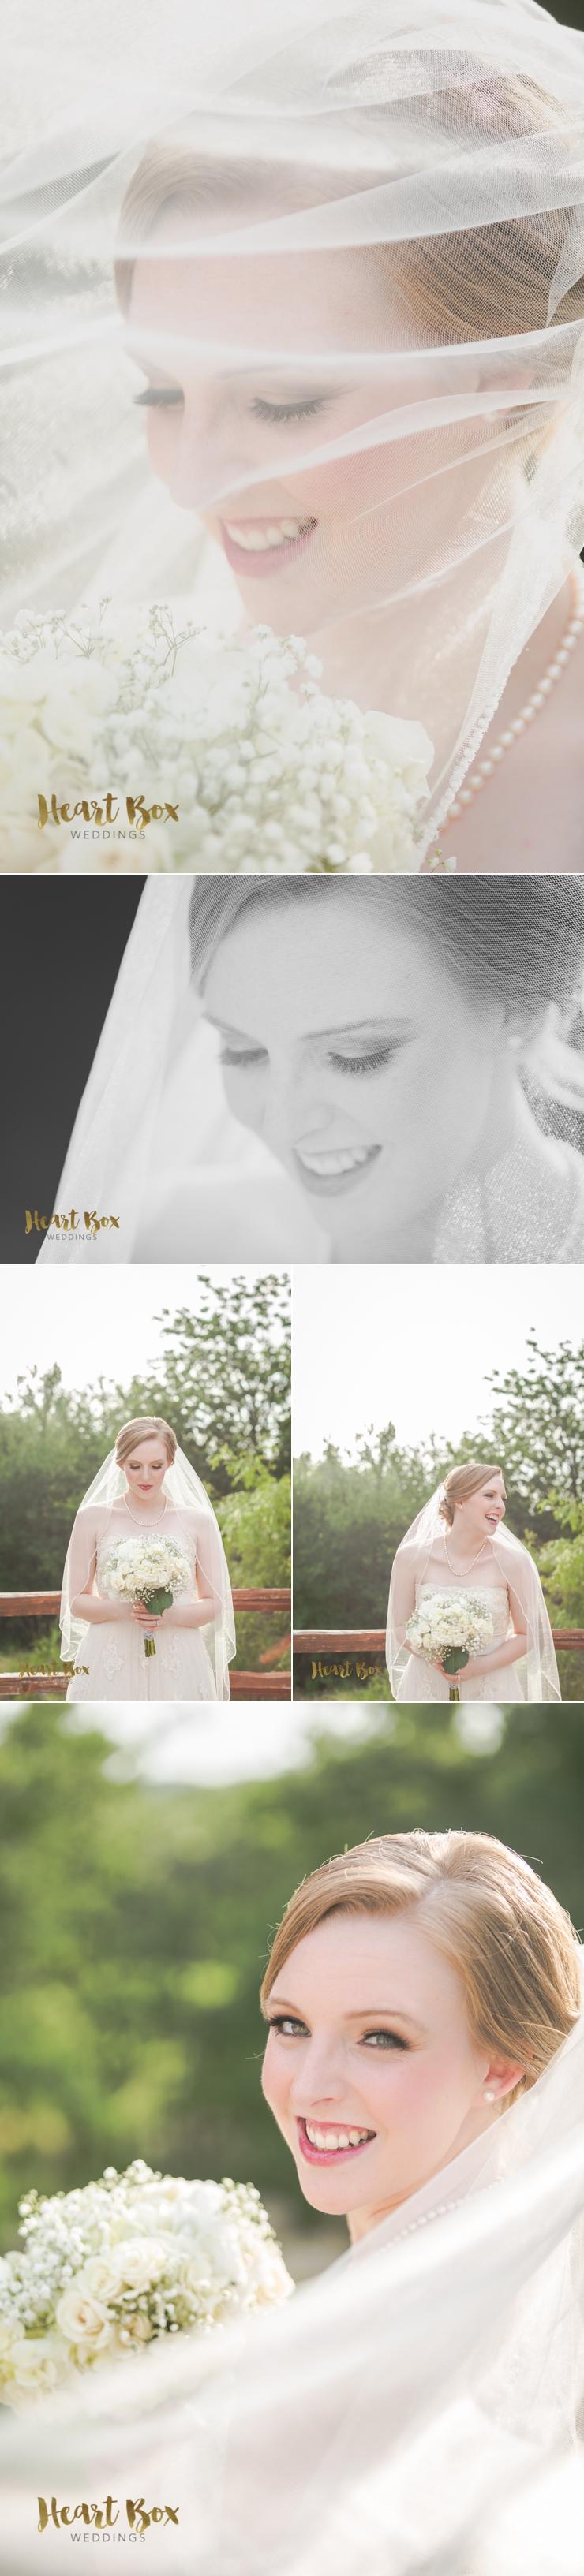 Kaylin Bridal Blog Collages 2.jpg